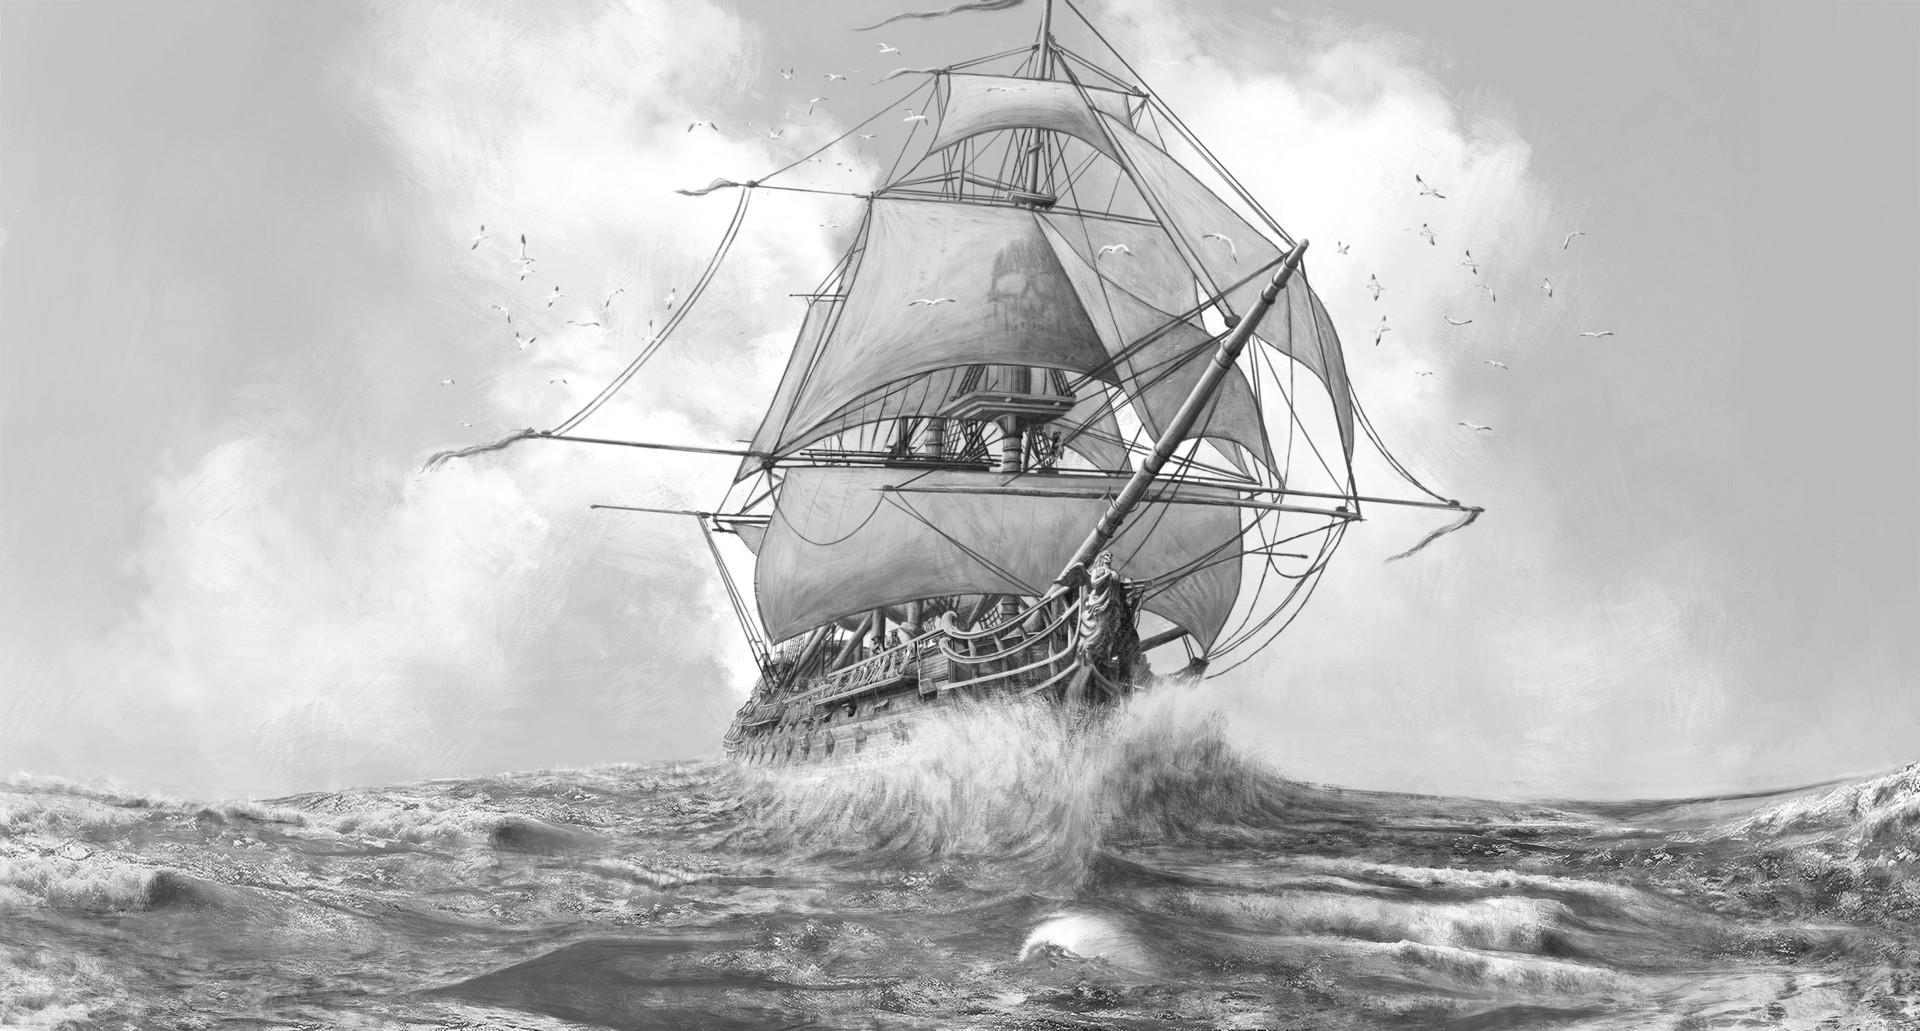 Martin seidl fancy pirate ship black and white mindre artstation